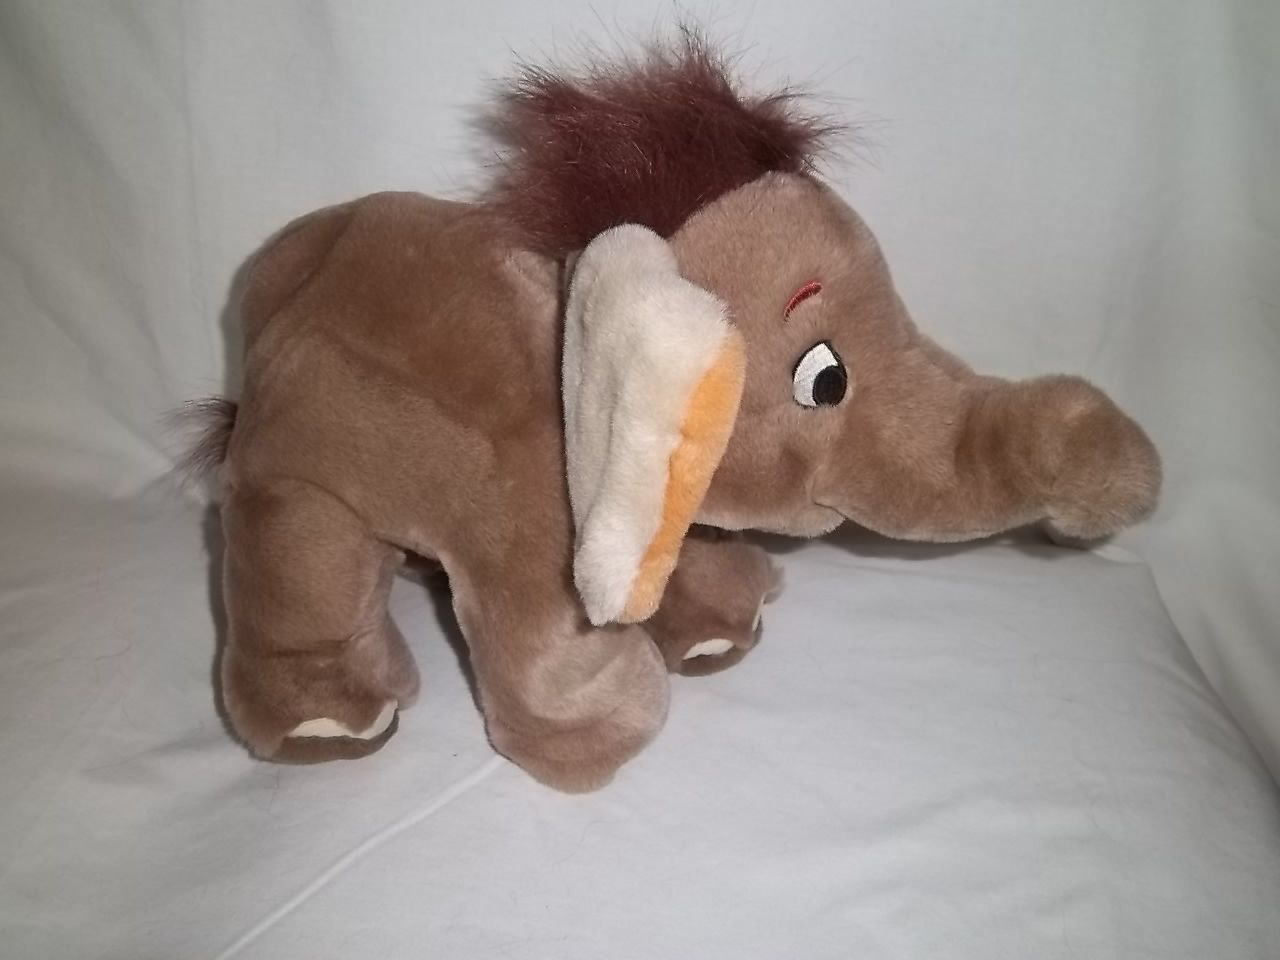 Jungle Book Plush Baby Elephant Disney Store Large Stuffed Animal Wolle Kaufen [ 960 x 1280 Pixel ]